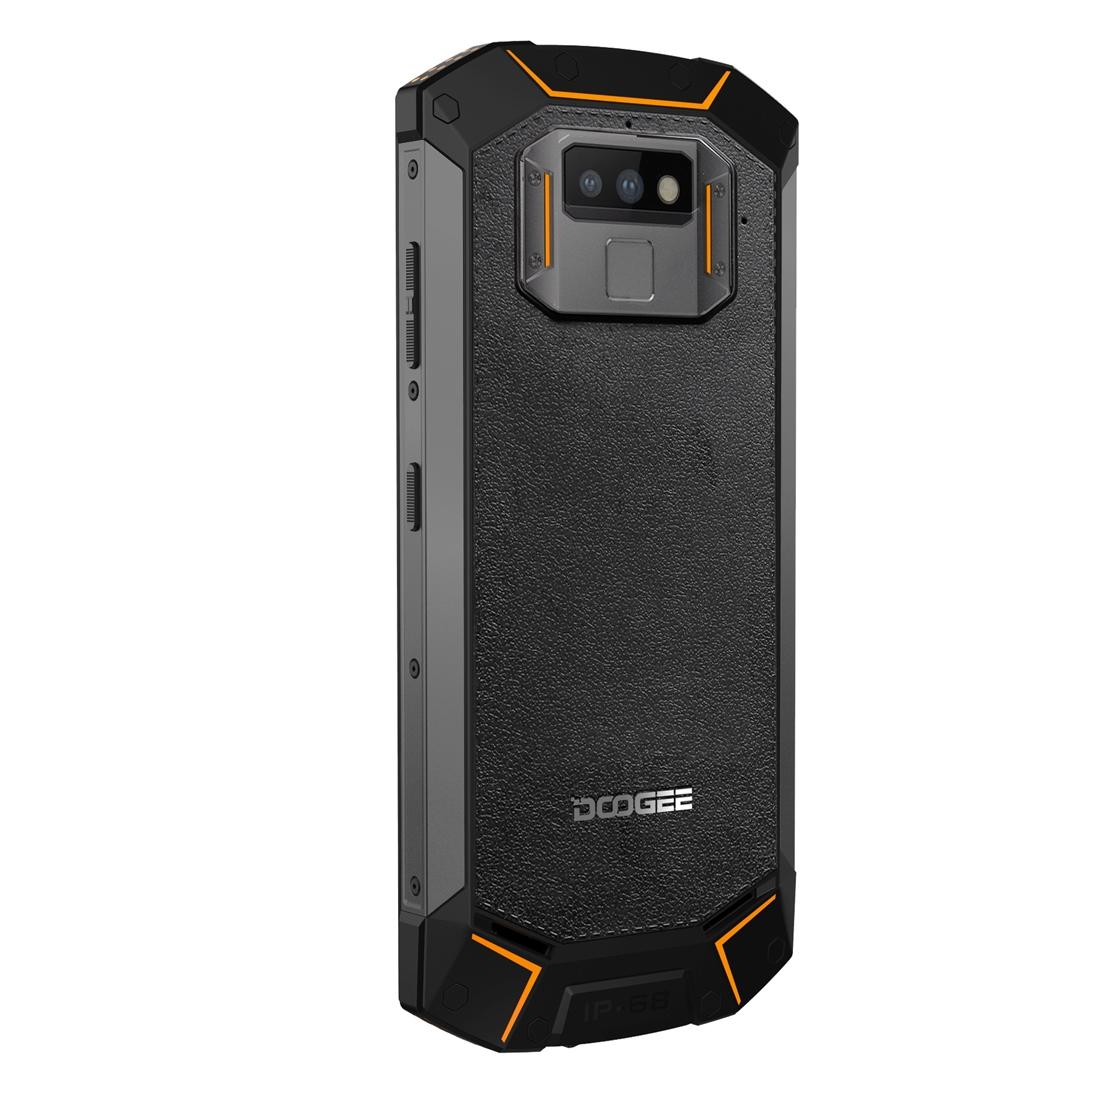 Проектор Смартфон DOOGEE S70 6GB+64GB Защита от влаги пыли ударов по стандарту IP68/IP69K MIL-STD-810G 5500мАч батарея Двойная камера (Фото 1)